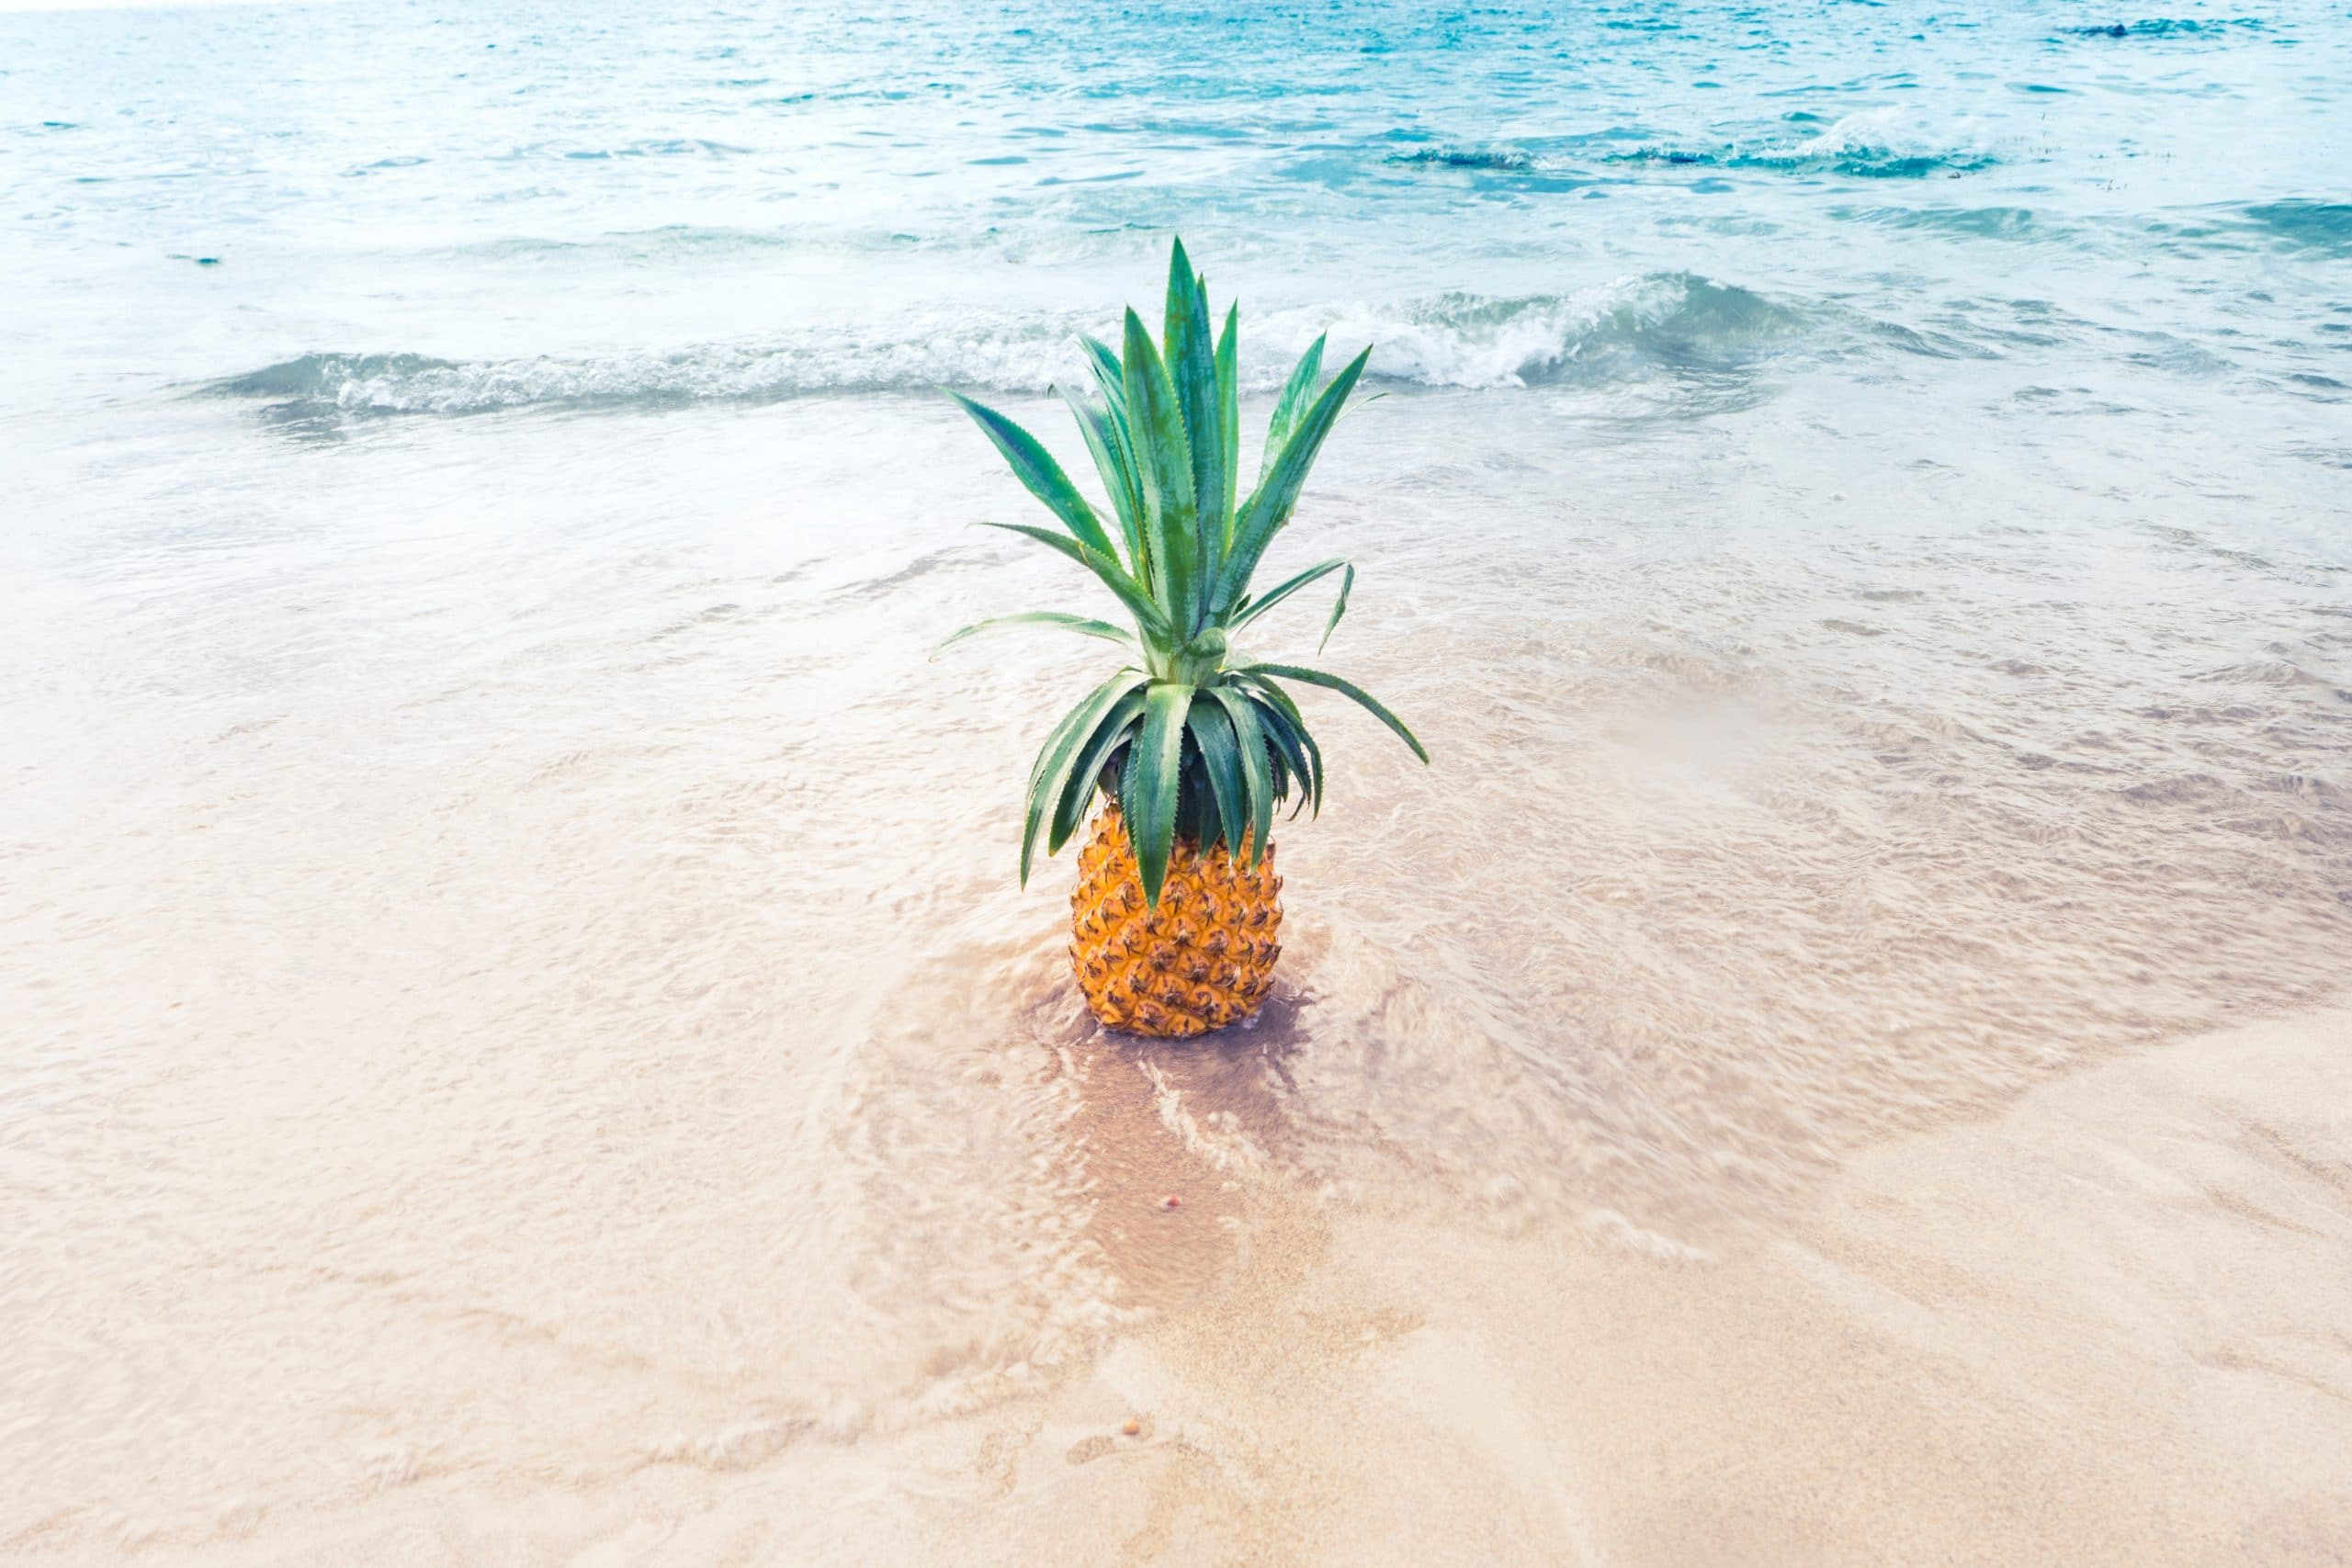 pinneapple-in-the-beach-summer-climate